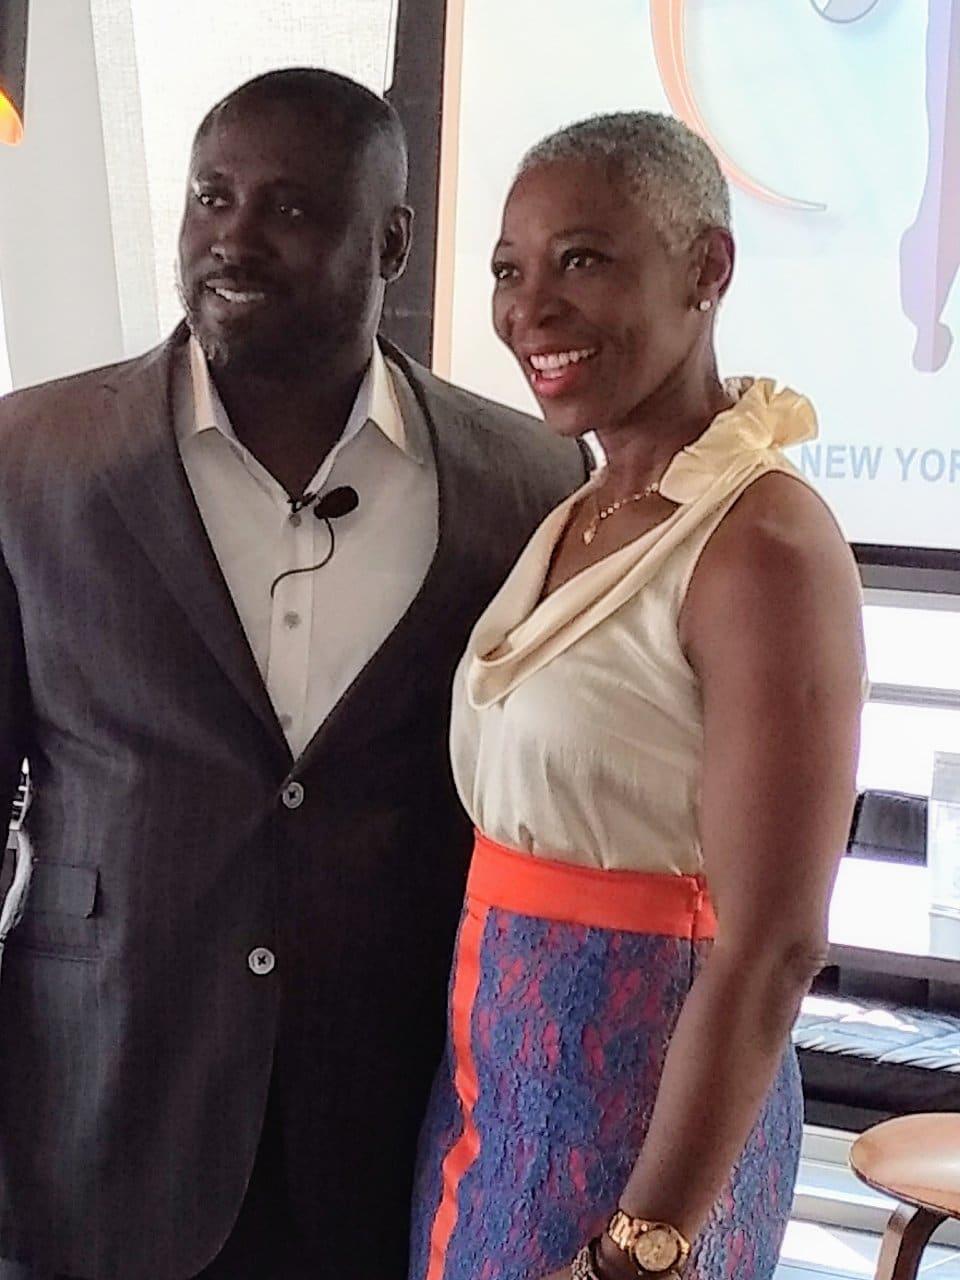 DiversityInc's Shane Nelson + D&I Executive Karen Brown